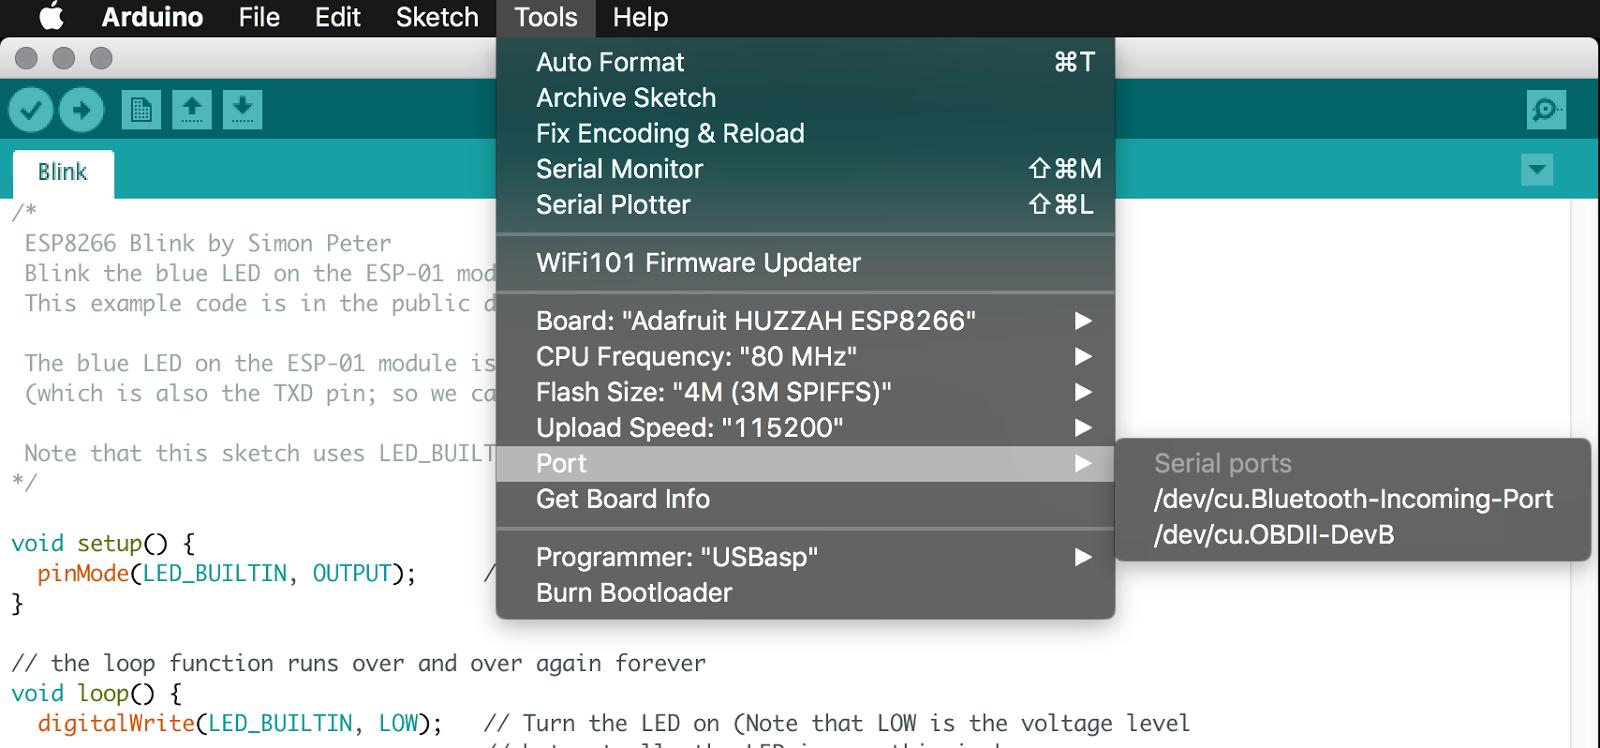 Adafruit Feather HUZZAH ESP8266 on macOS 10 13 High Sierra